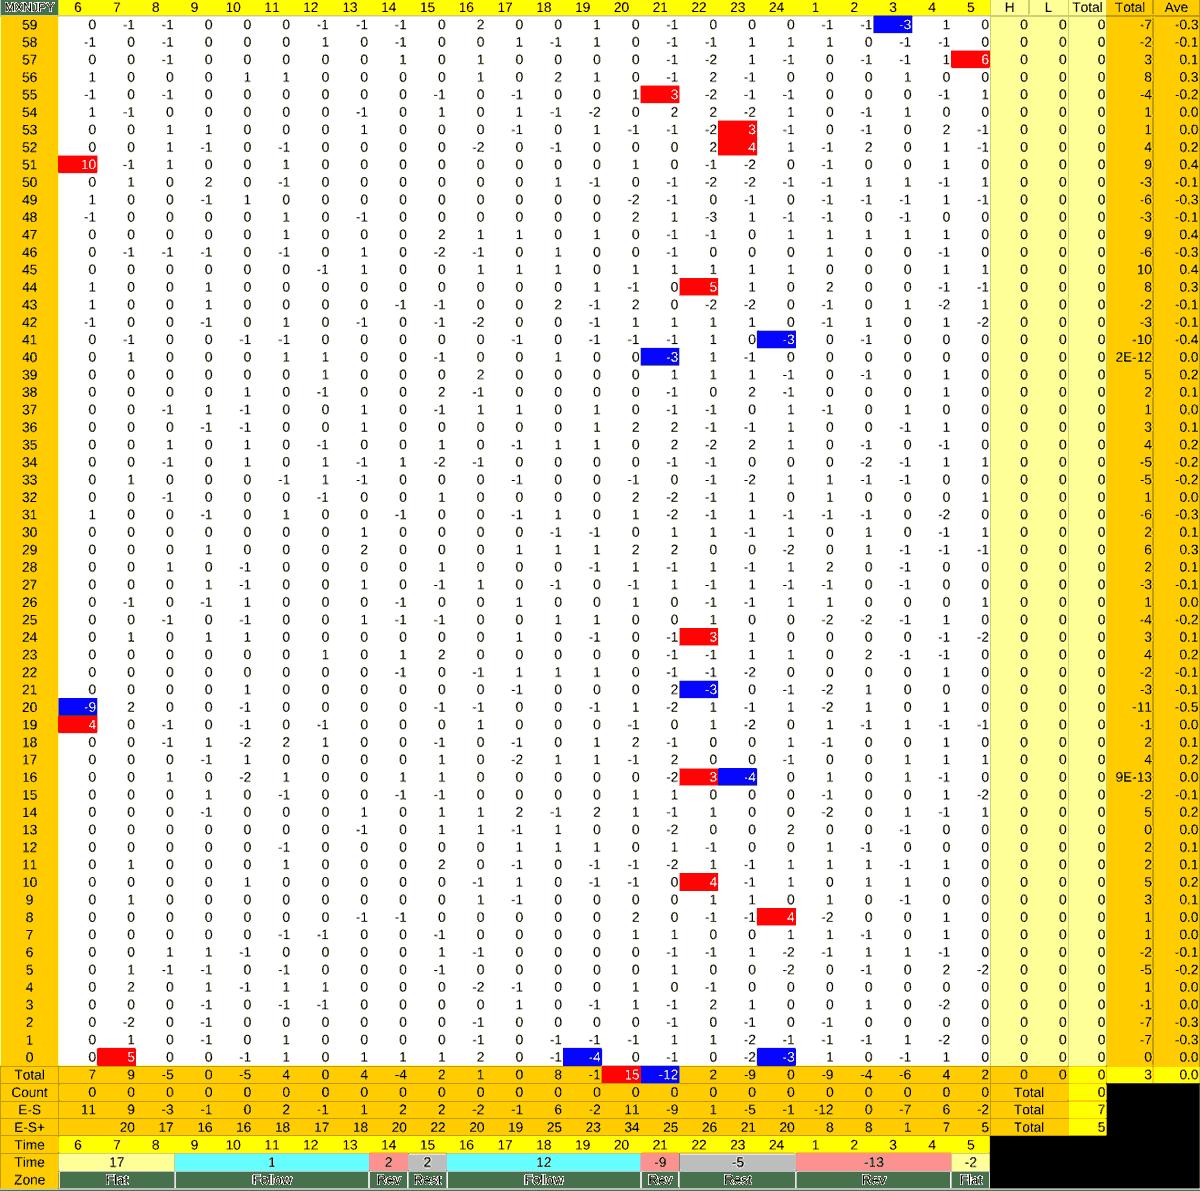 20210525_HS(3)MXNJPY